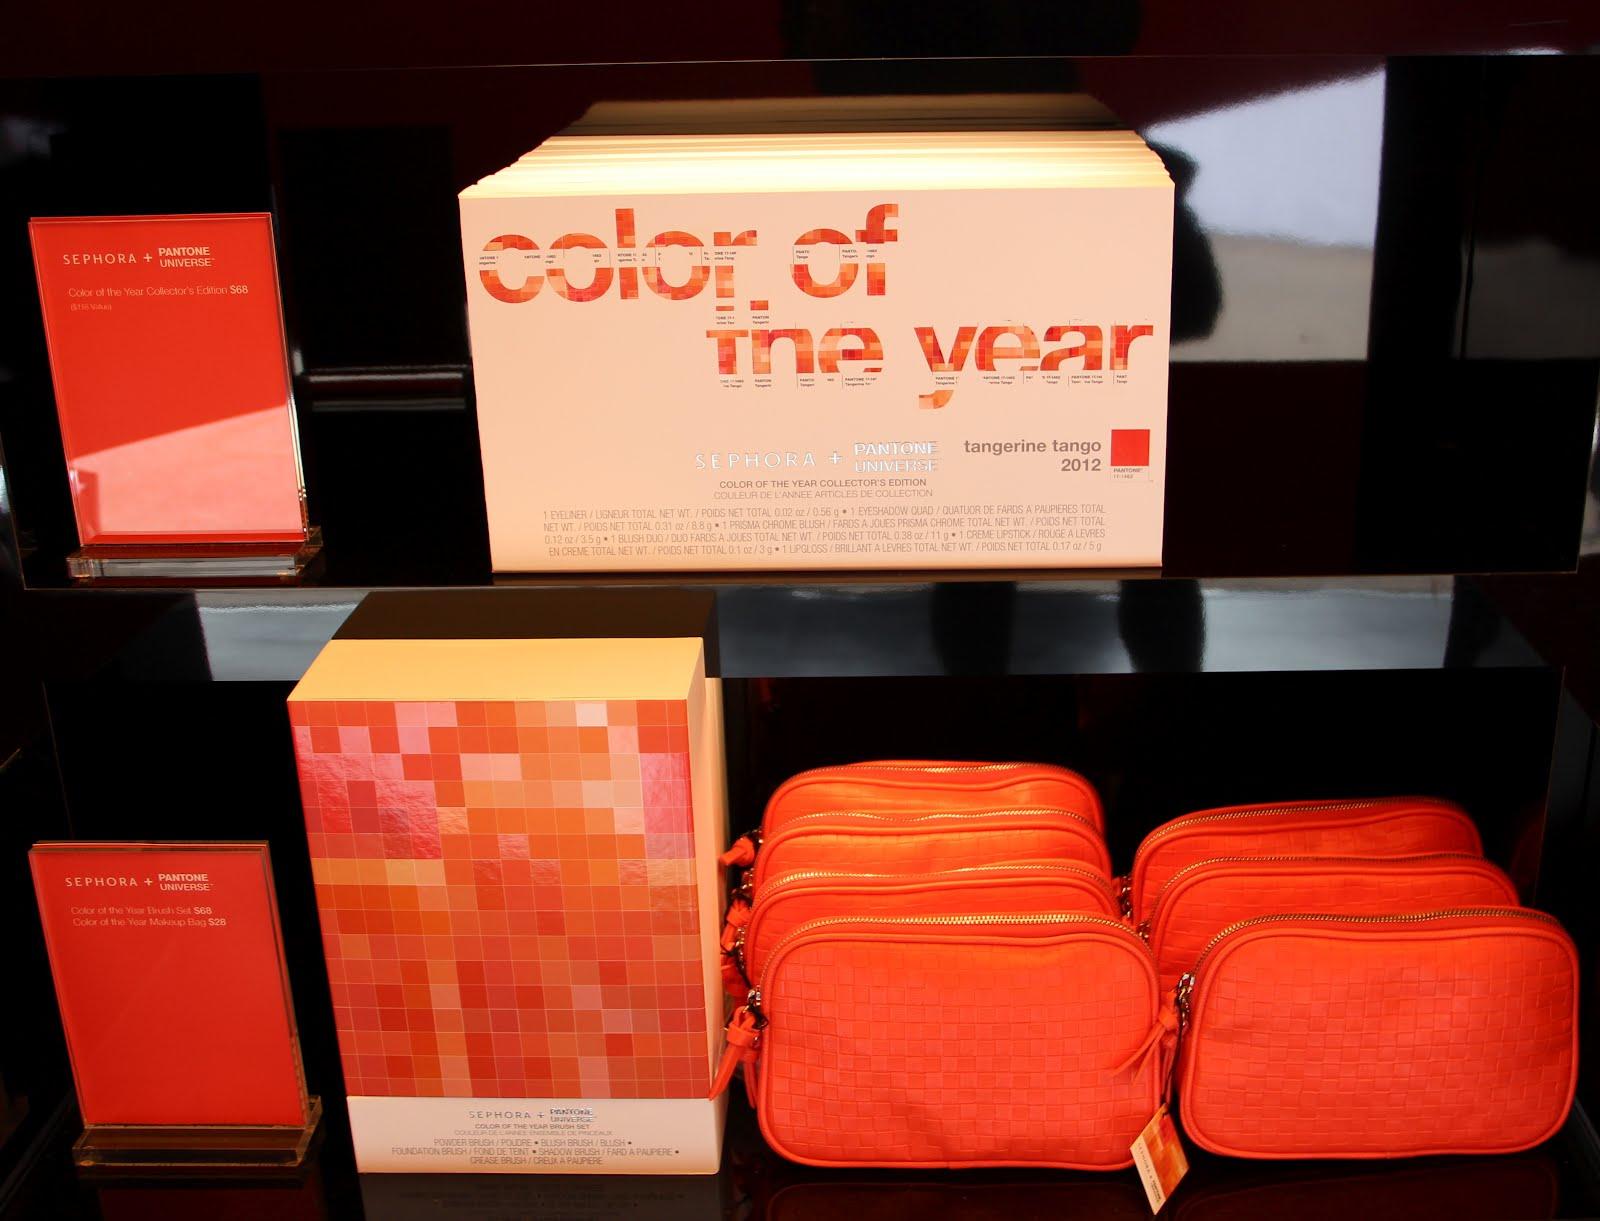 Watch Sephora Launches Pantone Tangerine Tango Collection video